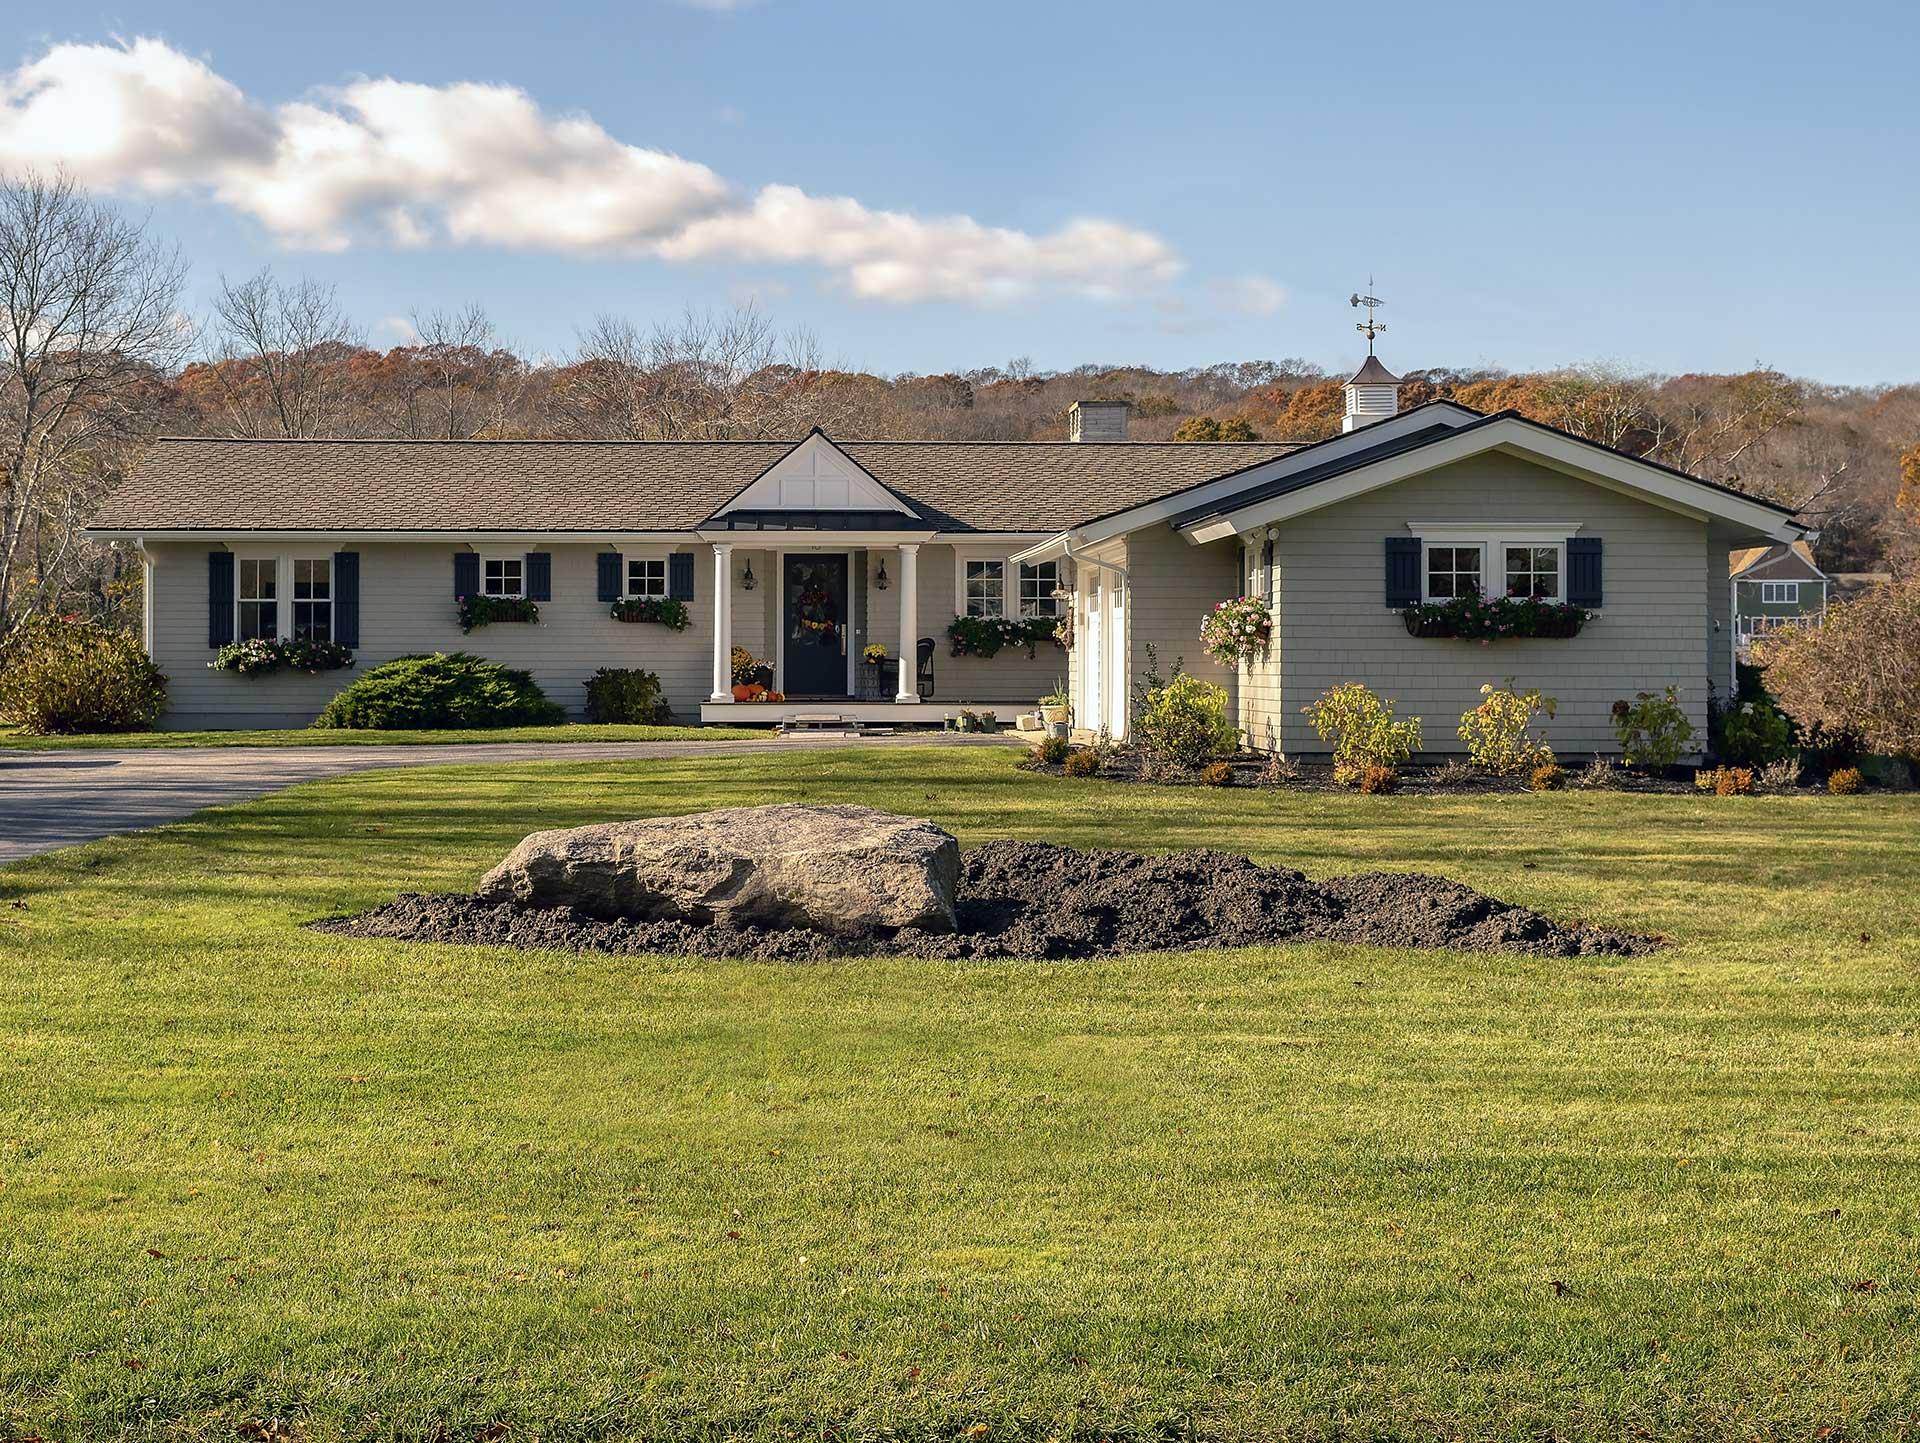 Stephen Sullivan - Custom Home Builders - Rhode Island - Narrow River Cottage feature photo